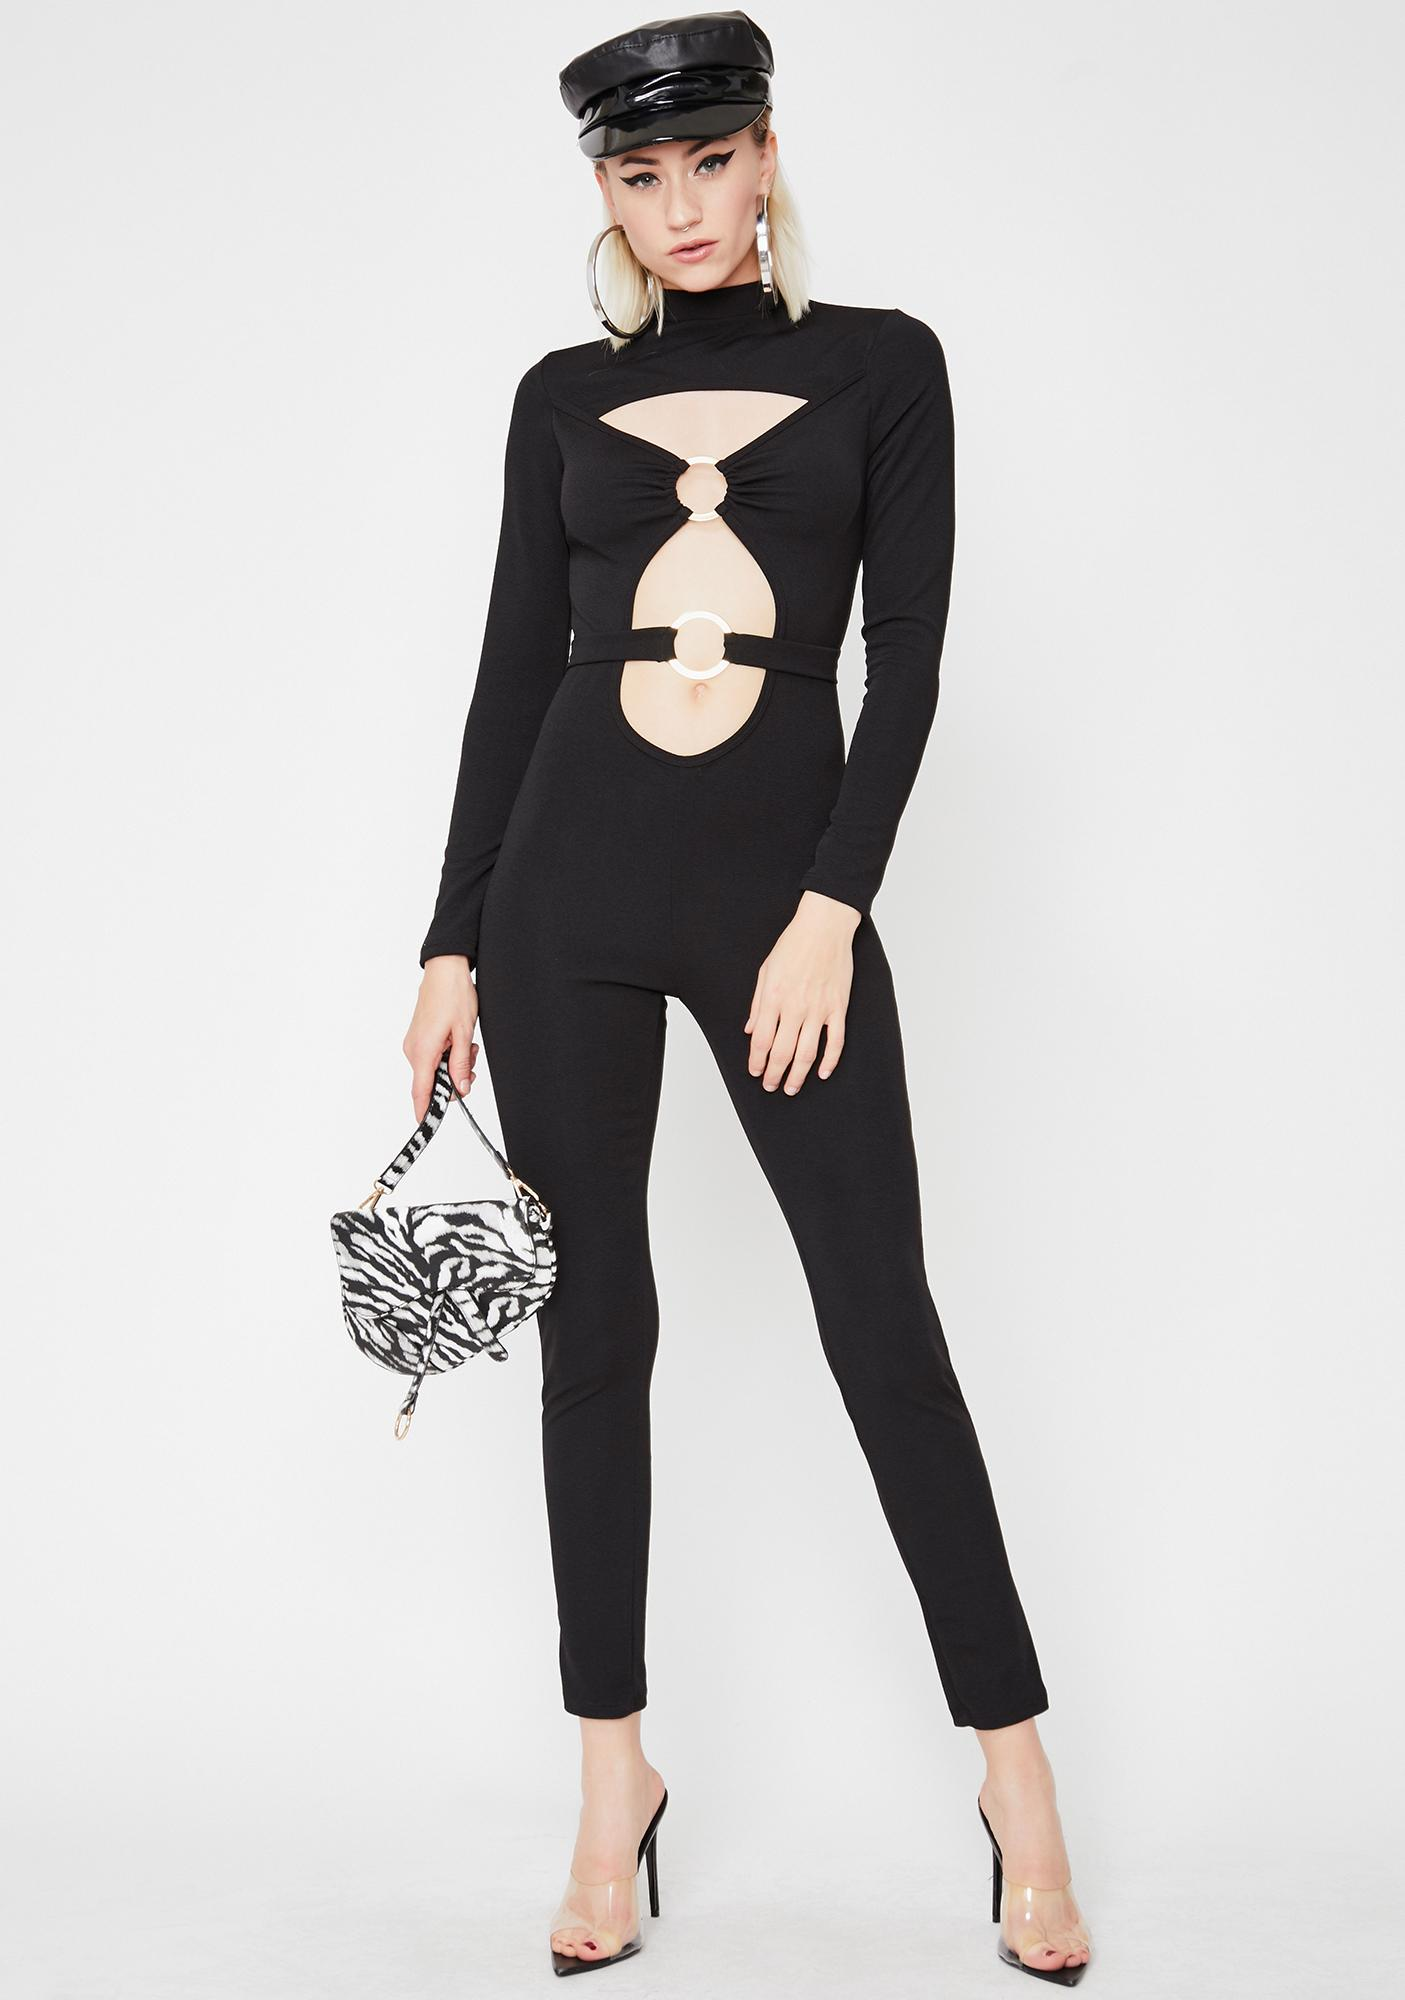 A La Mode O-Ring Catsuit